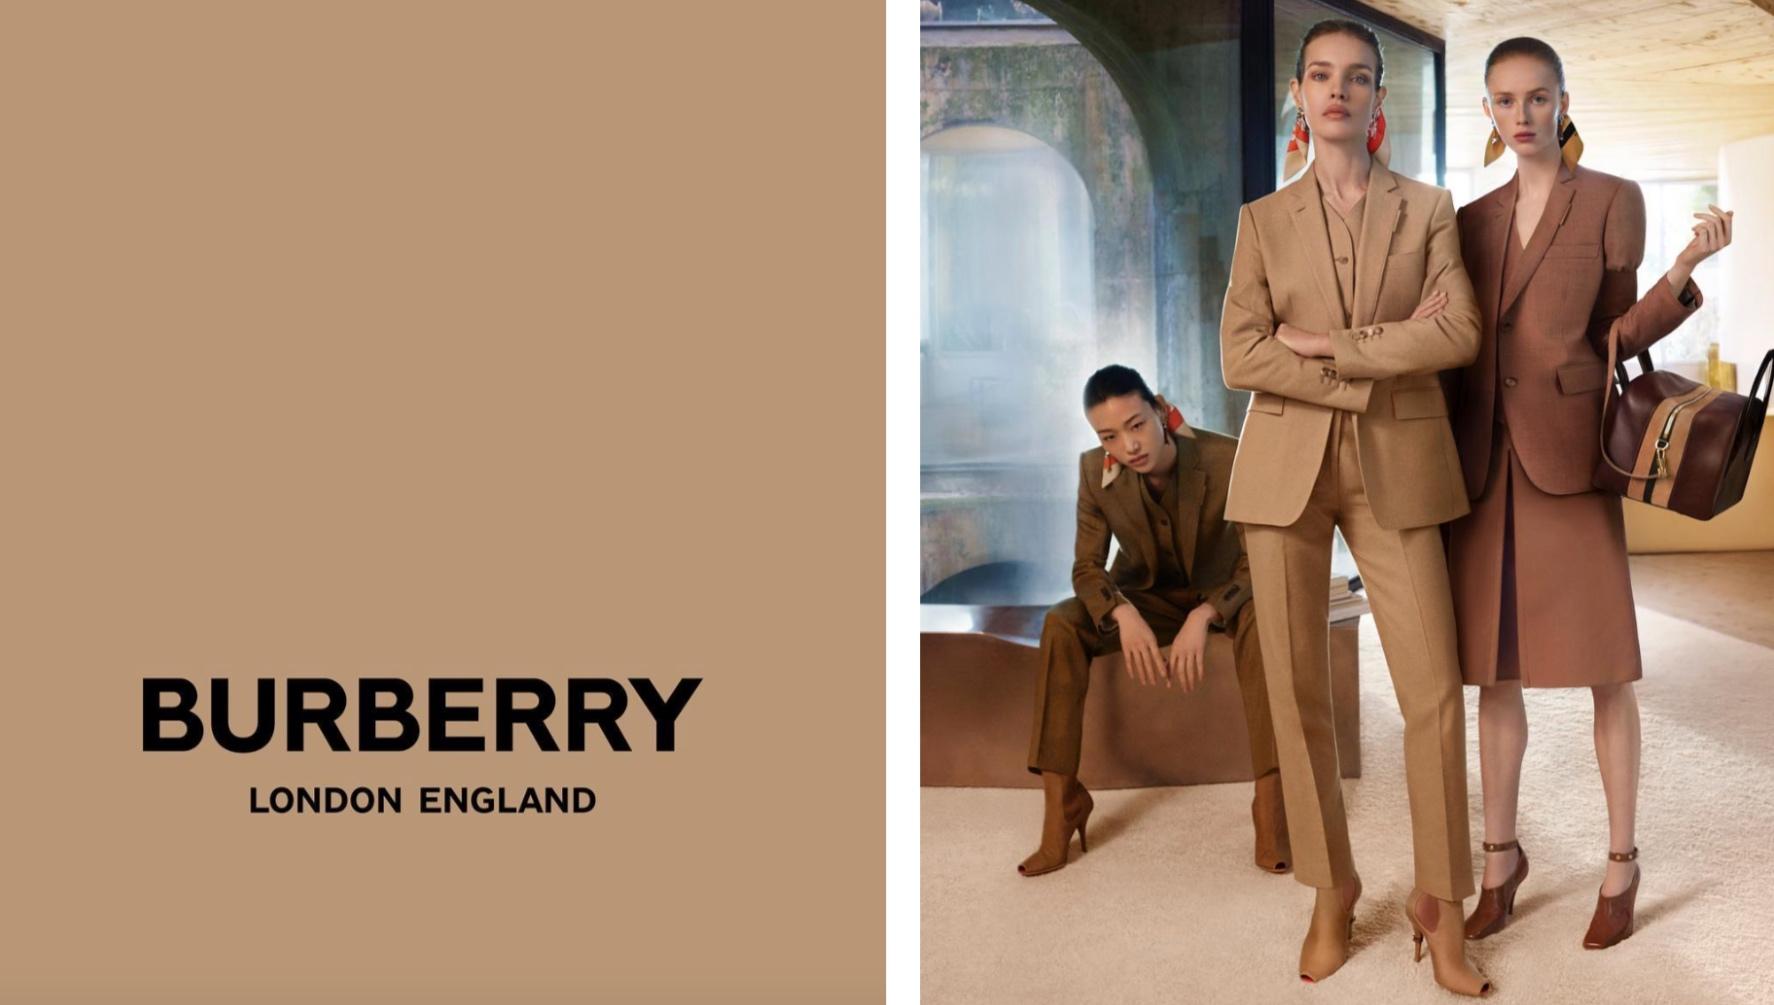 image: Burberry